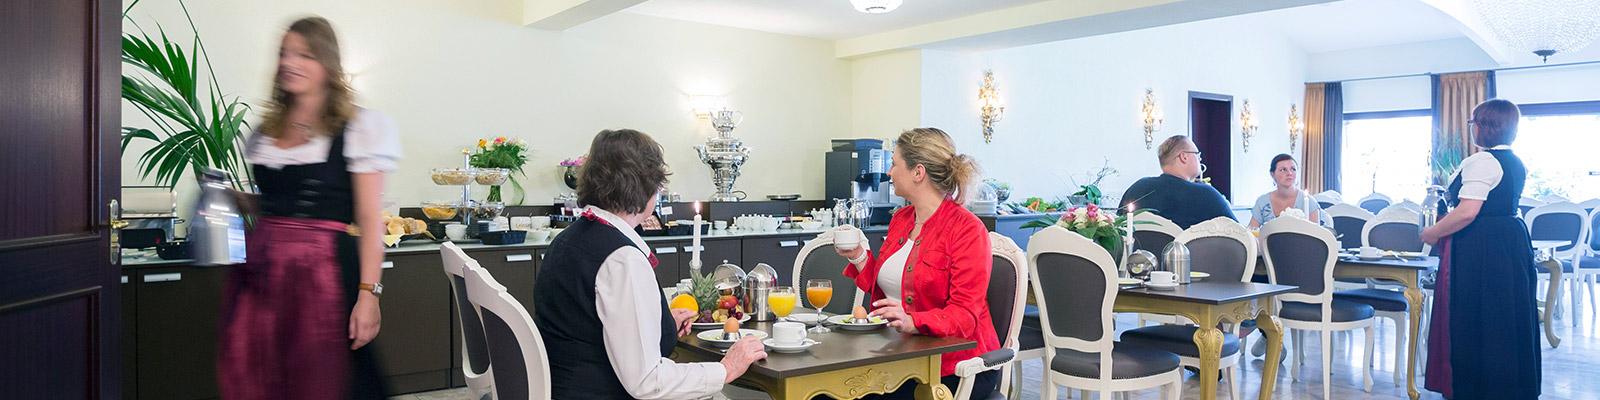 Frühstücksbuffet und Brunch im City Hotel Antik Aalen